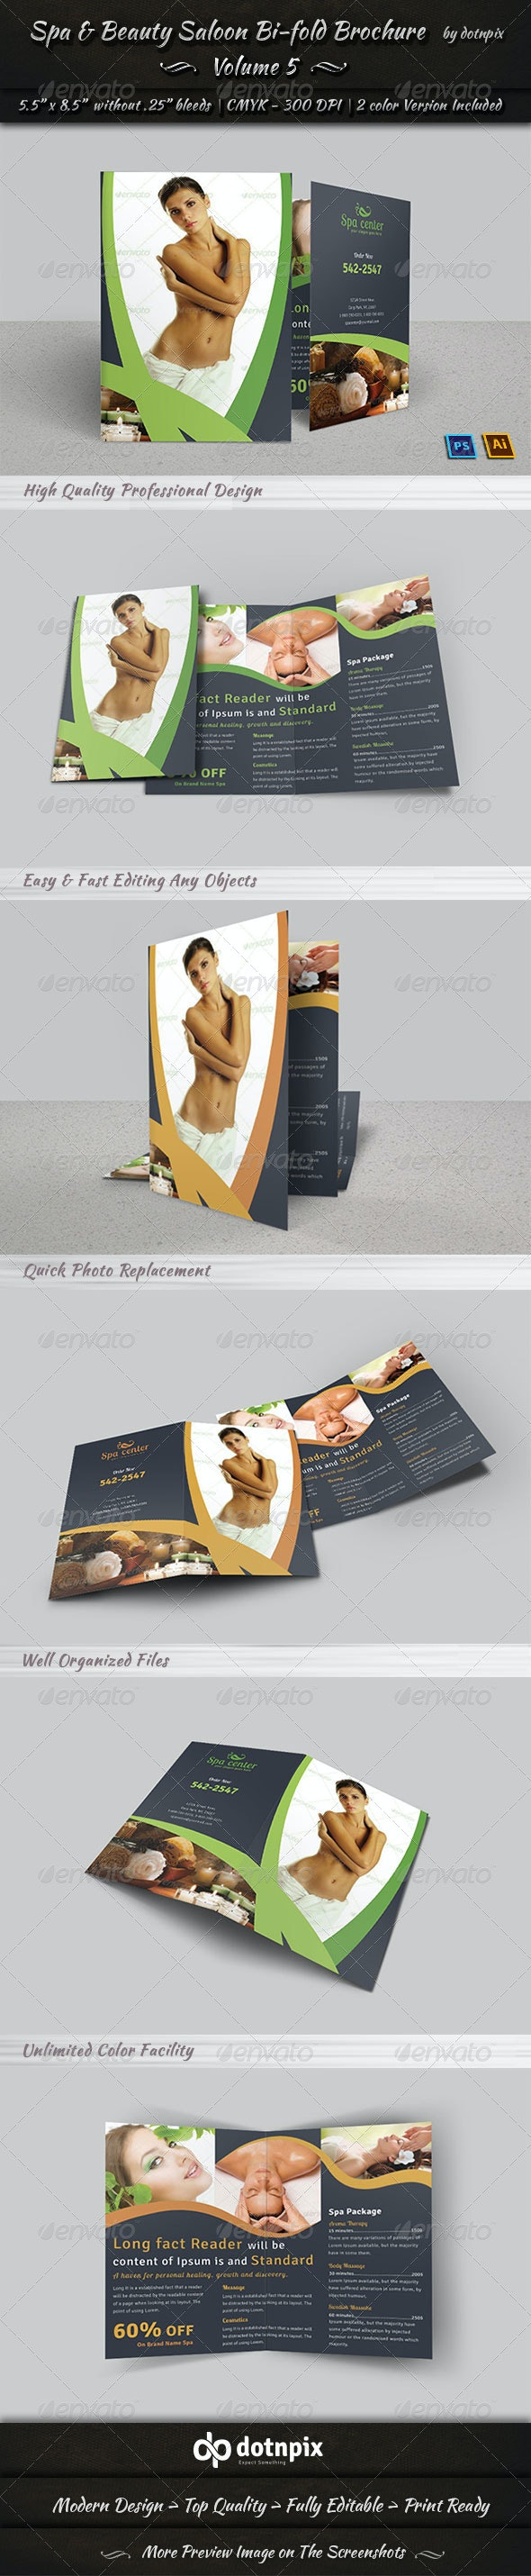 Spa & Beauty Saloon Bi-fold Brochure     Volume 5 - Corporate Brochures